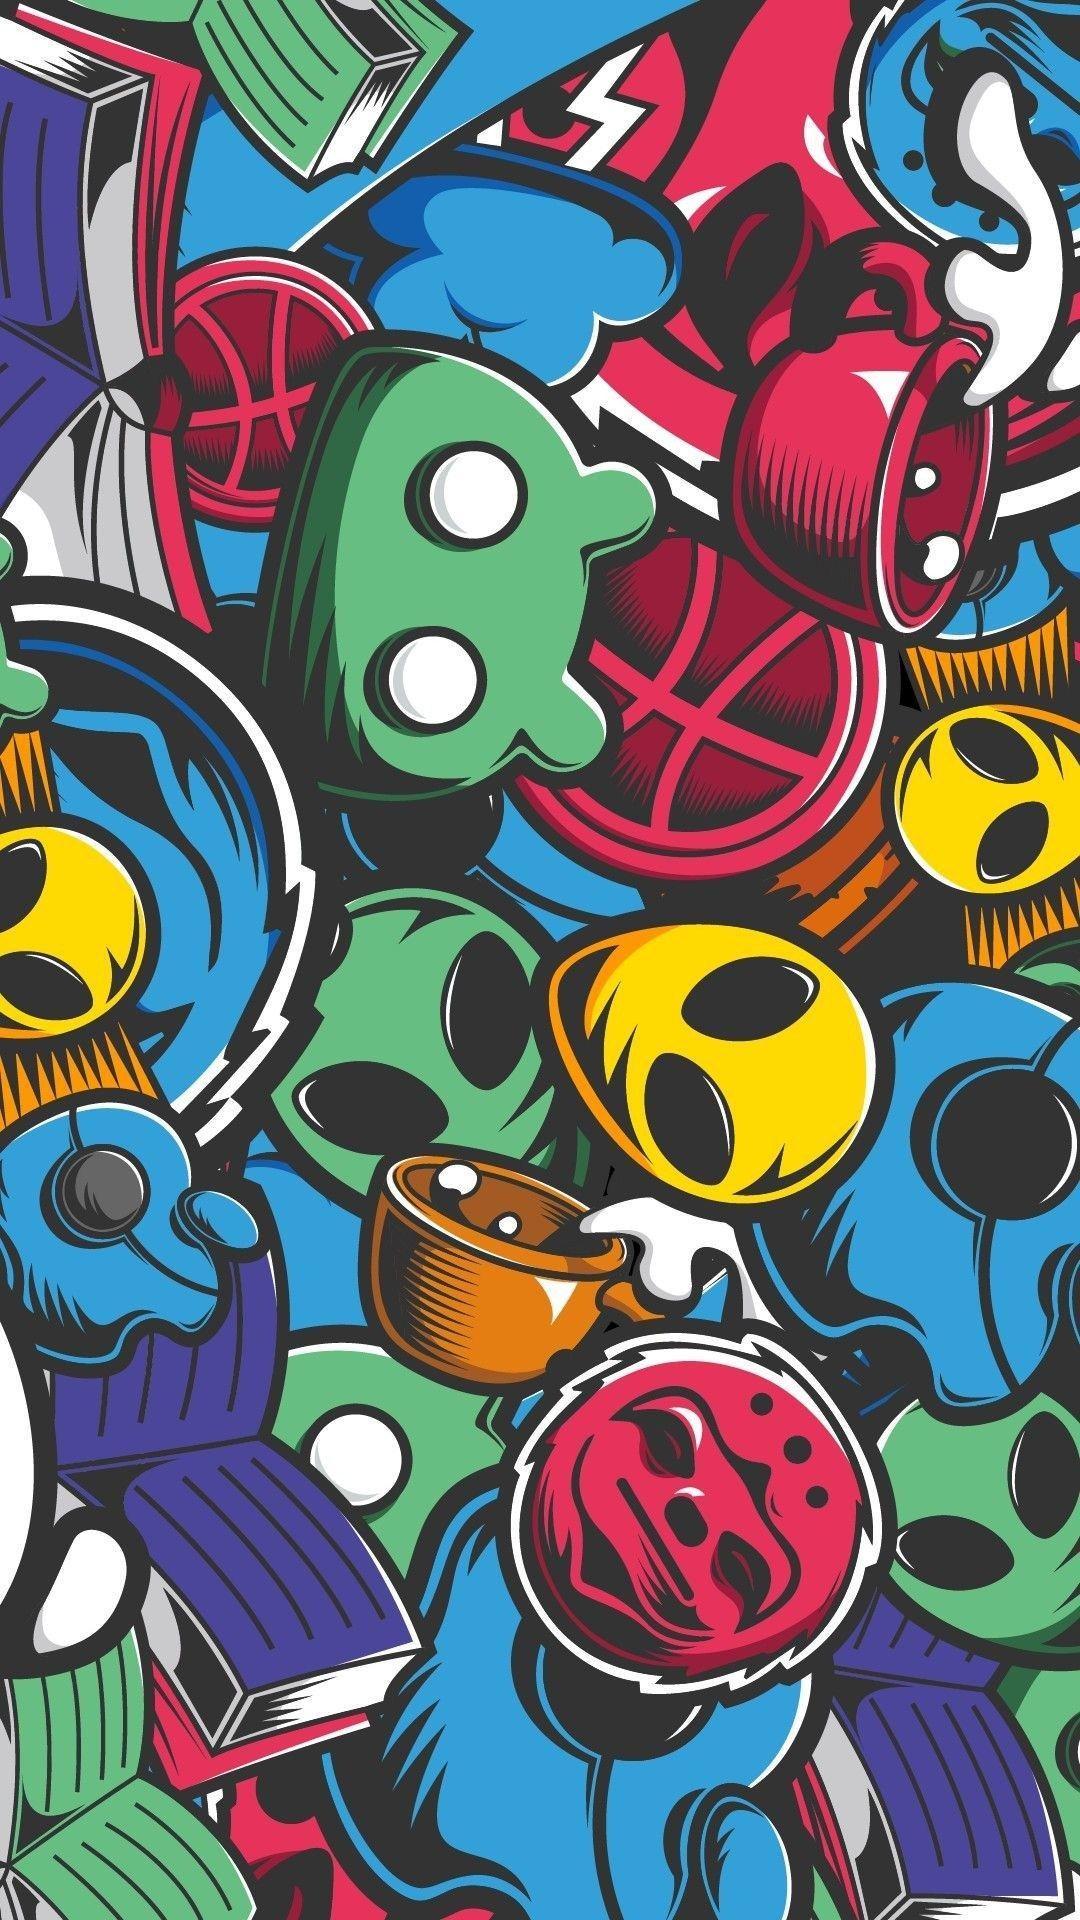 Dope bape wallpapers top free dope bape backgrounds - Bape wallpaper ...